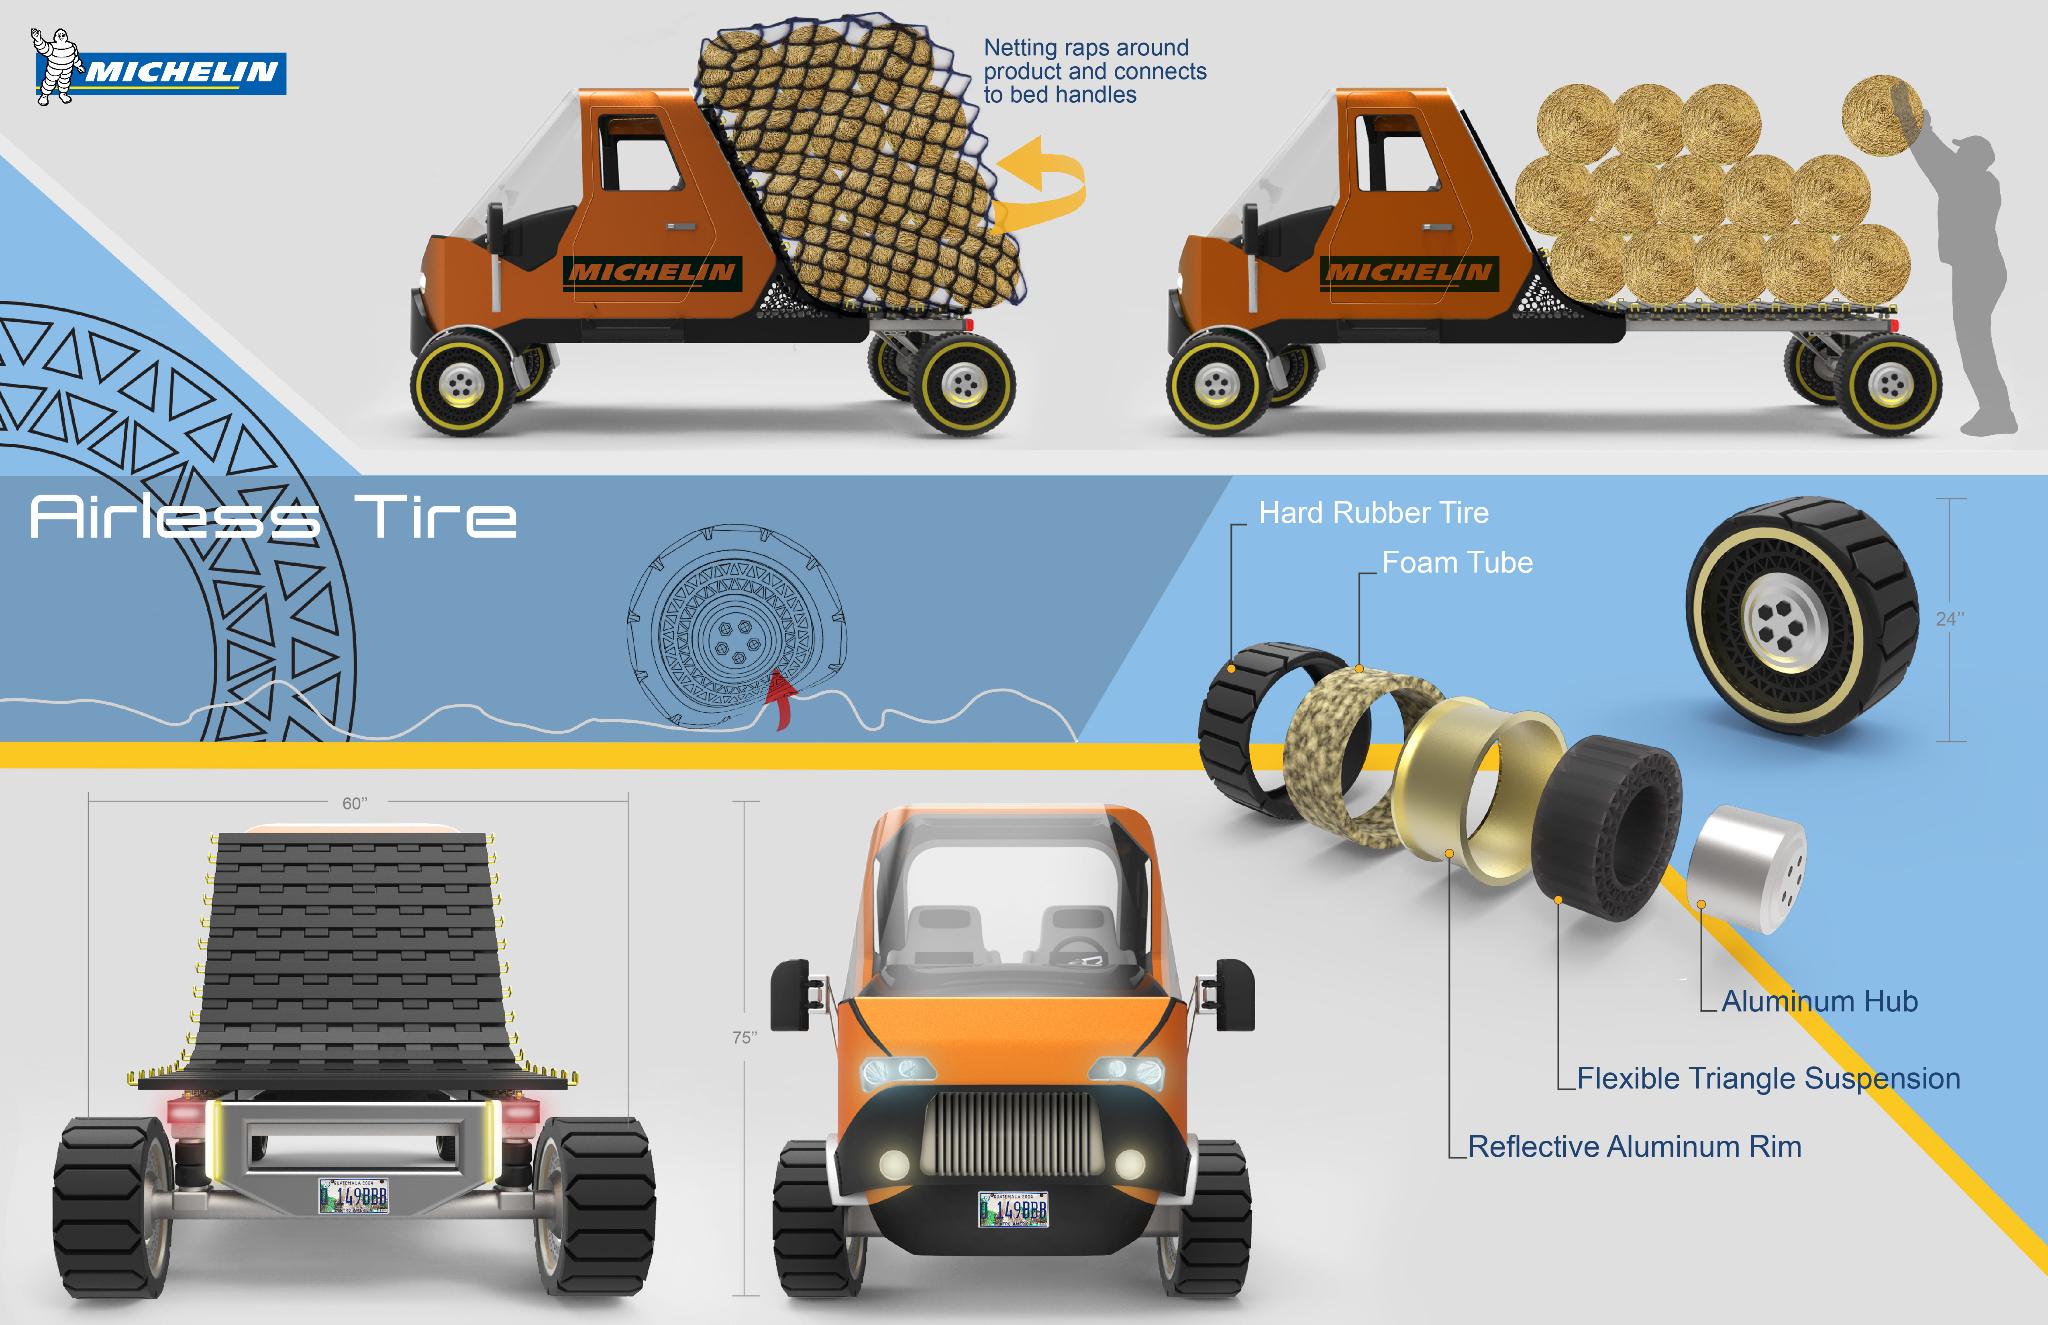 how to use aluminium and gallium as alternative fuel sorce